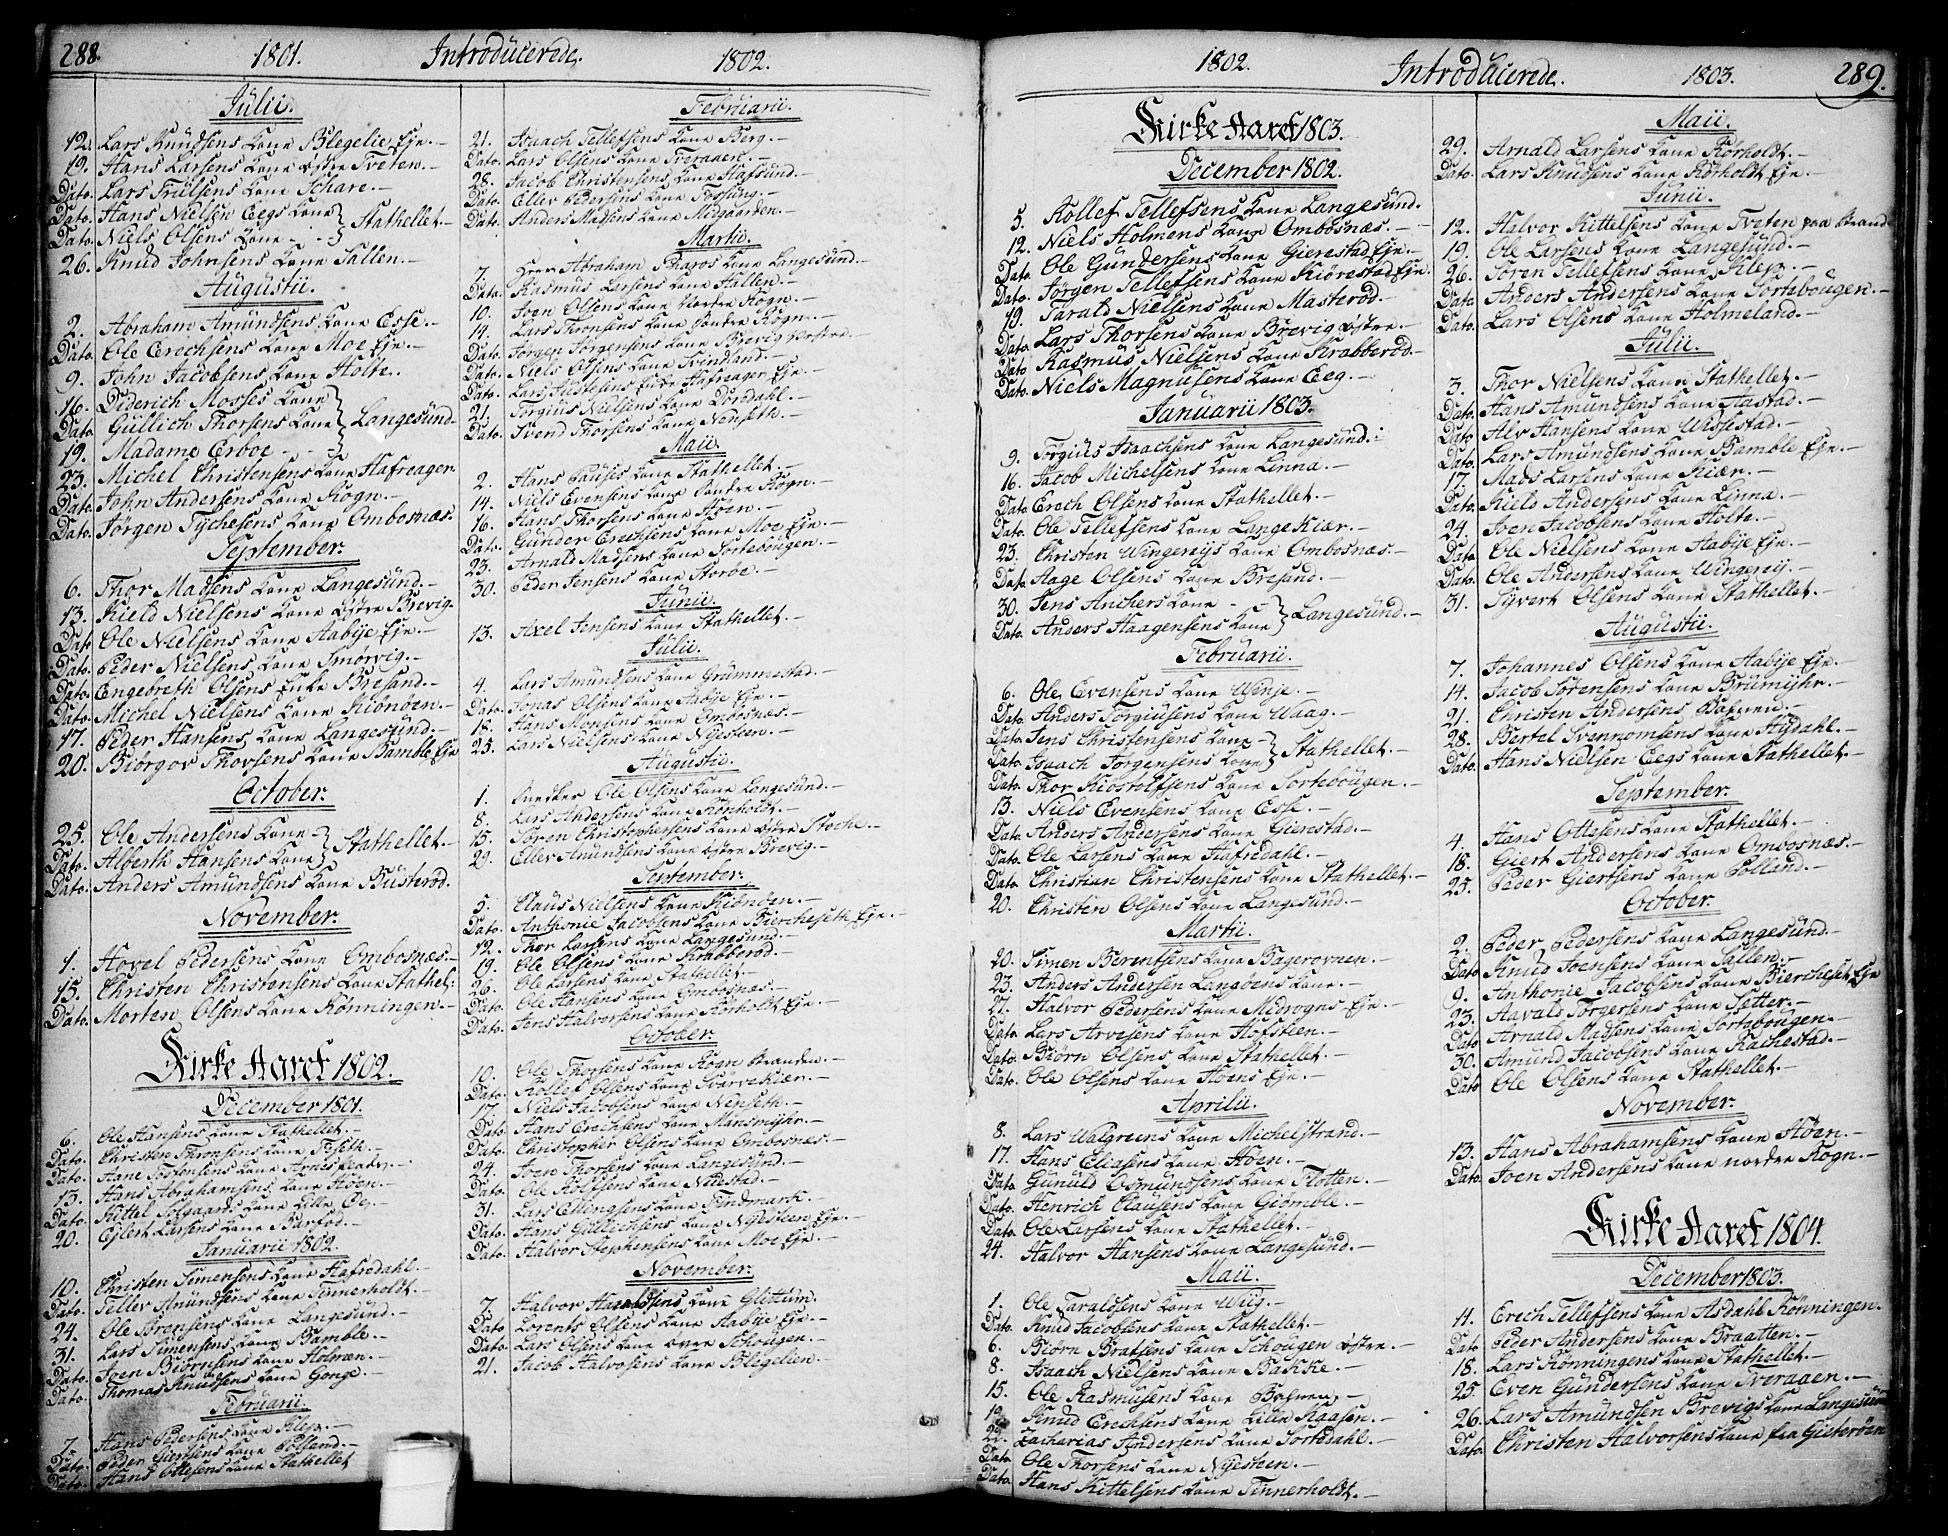 SAKO, Bamble kirkebøker, F/Fa/L0002: Ministerialbok nr. I 2, 1775-1814, s. 288-289